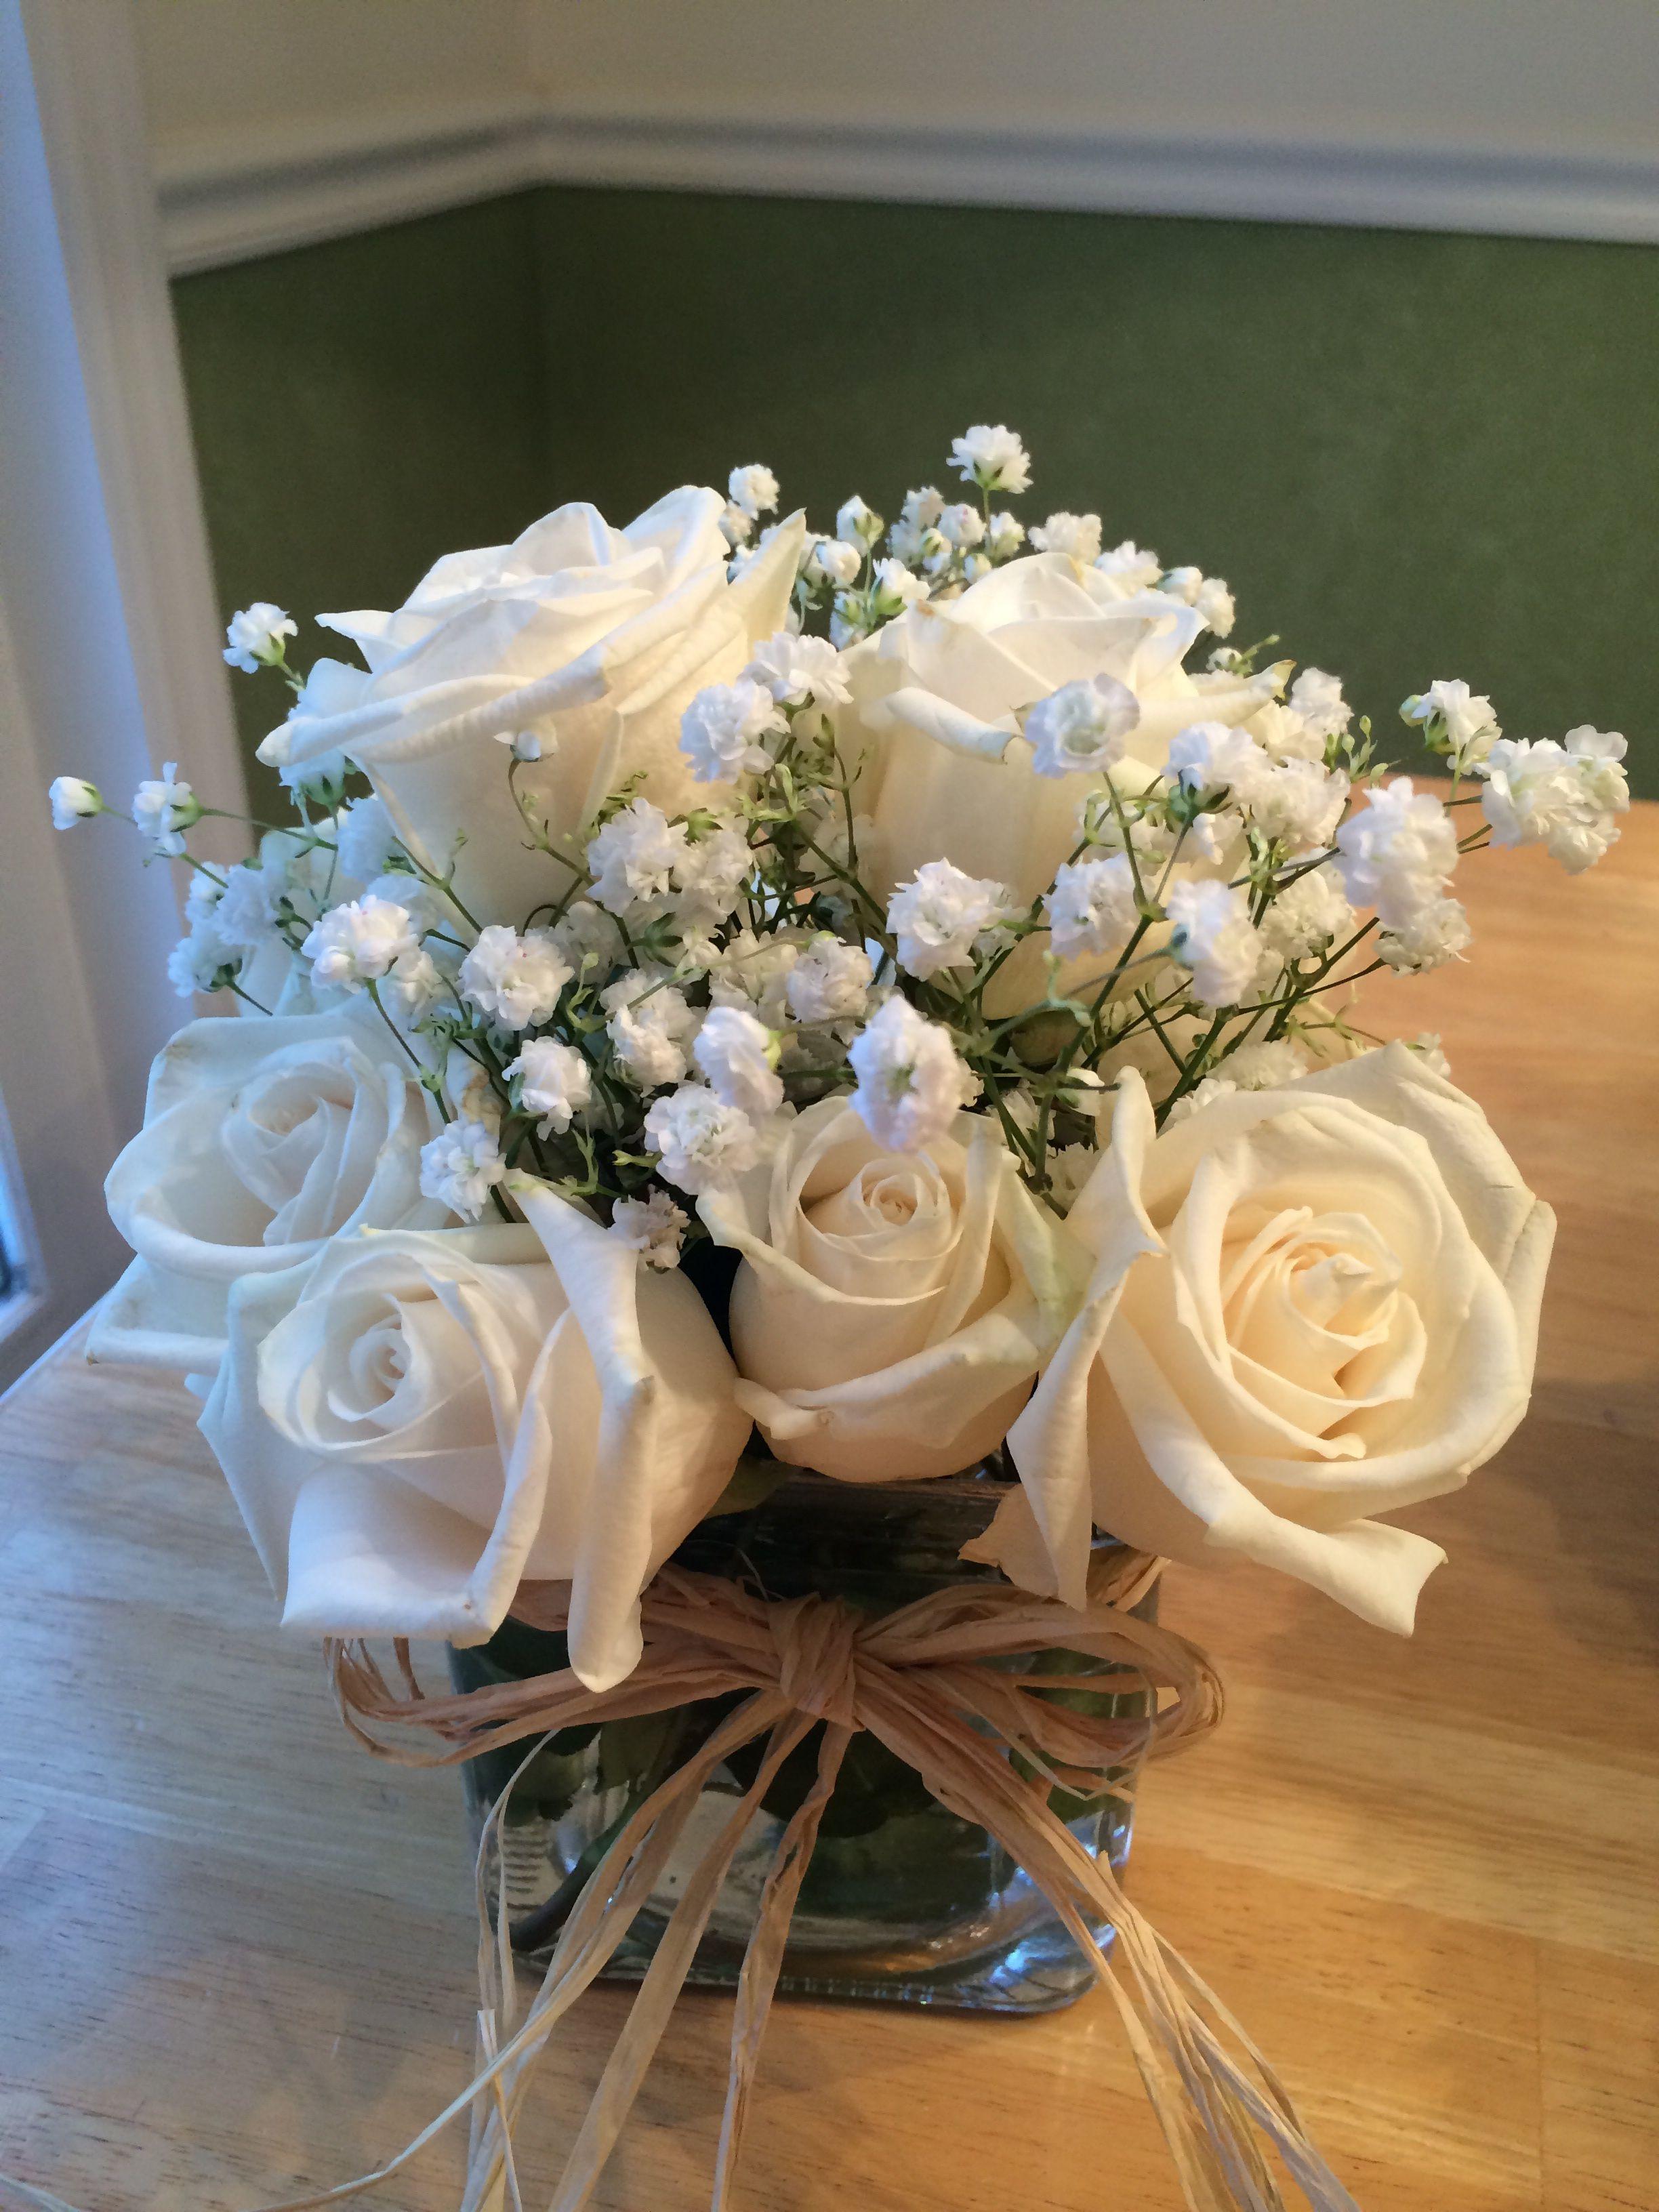 A dozen roses in a small 4x4x4 vase tie raffia around